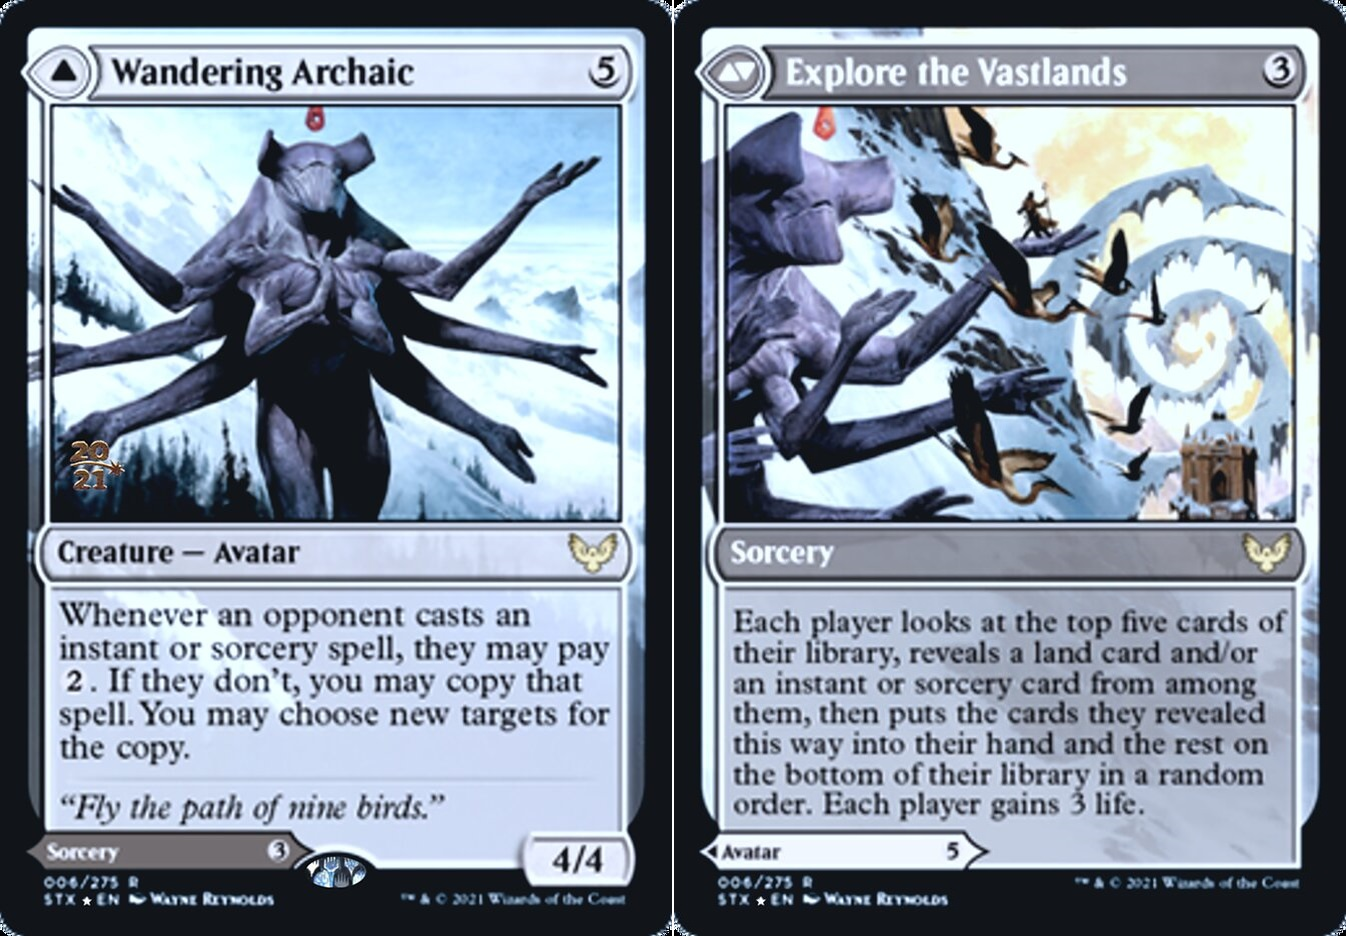 Wandering Archaic // Explore the Vastlands - Foil - Prerelease Promo